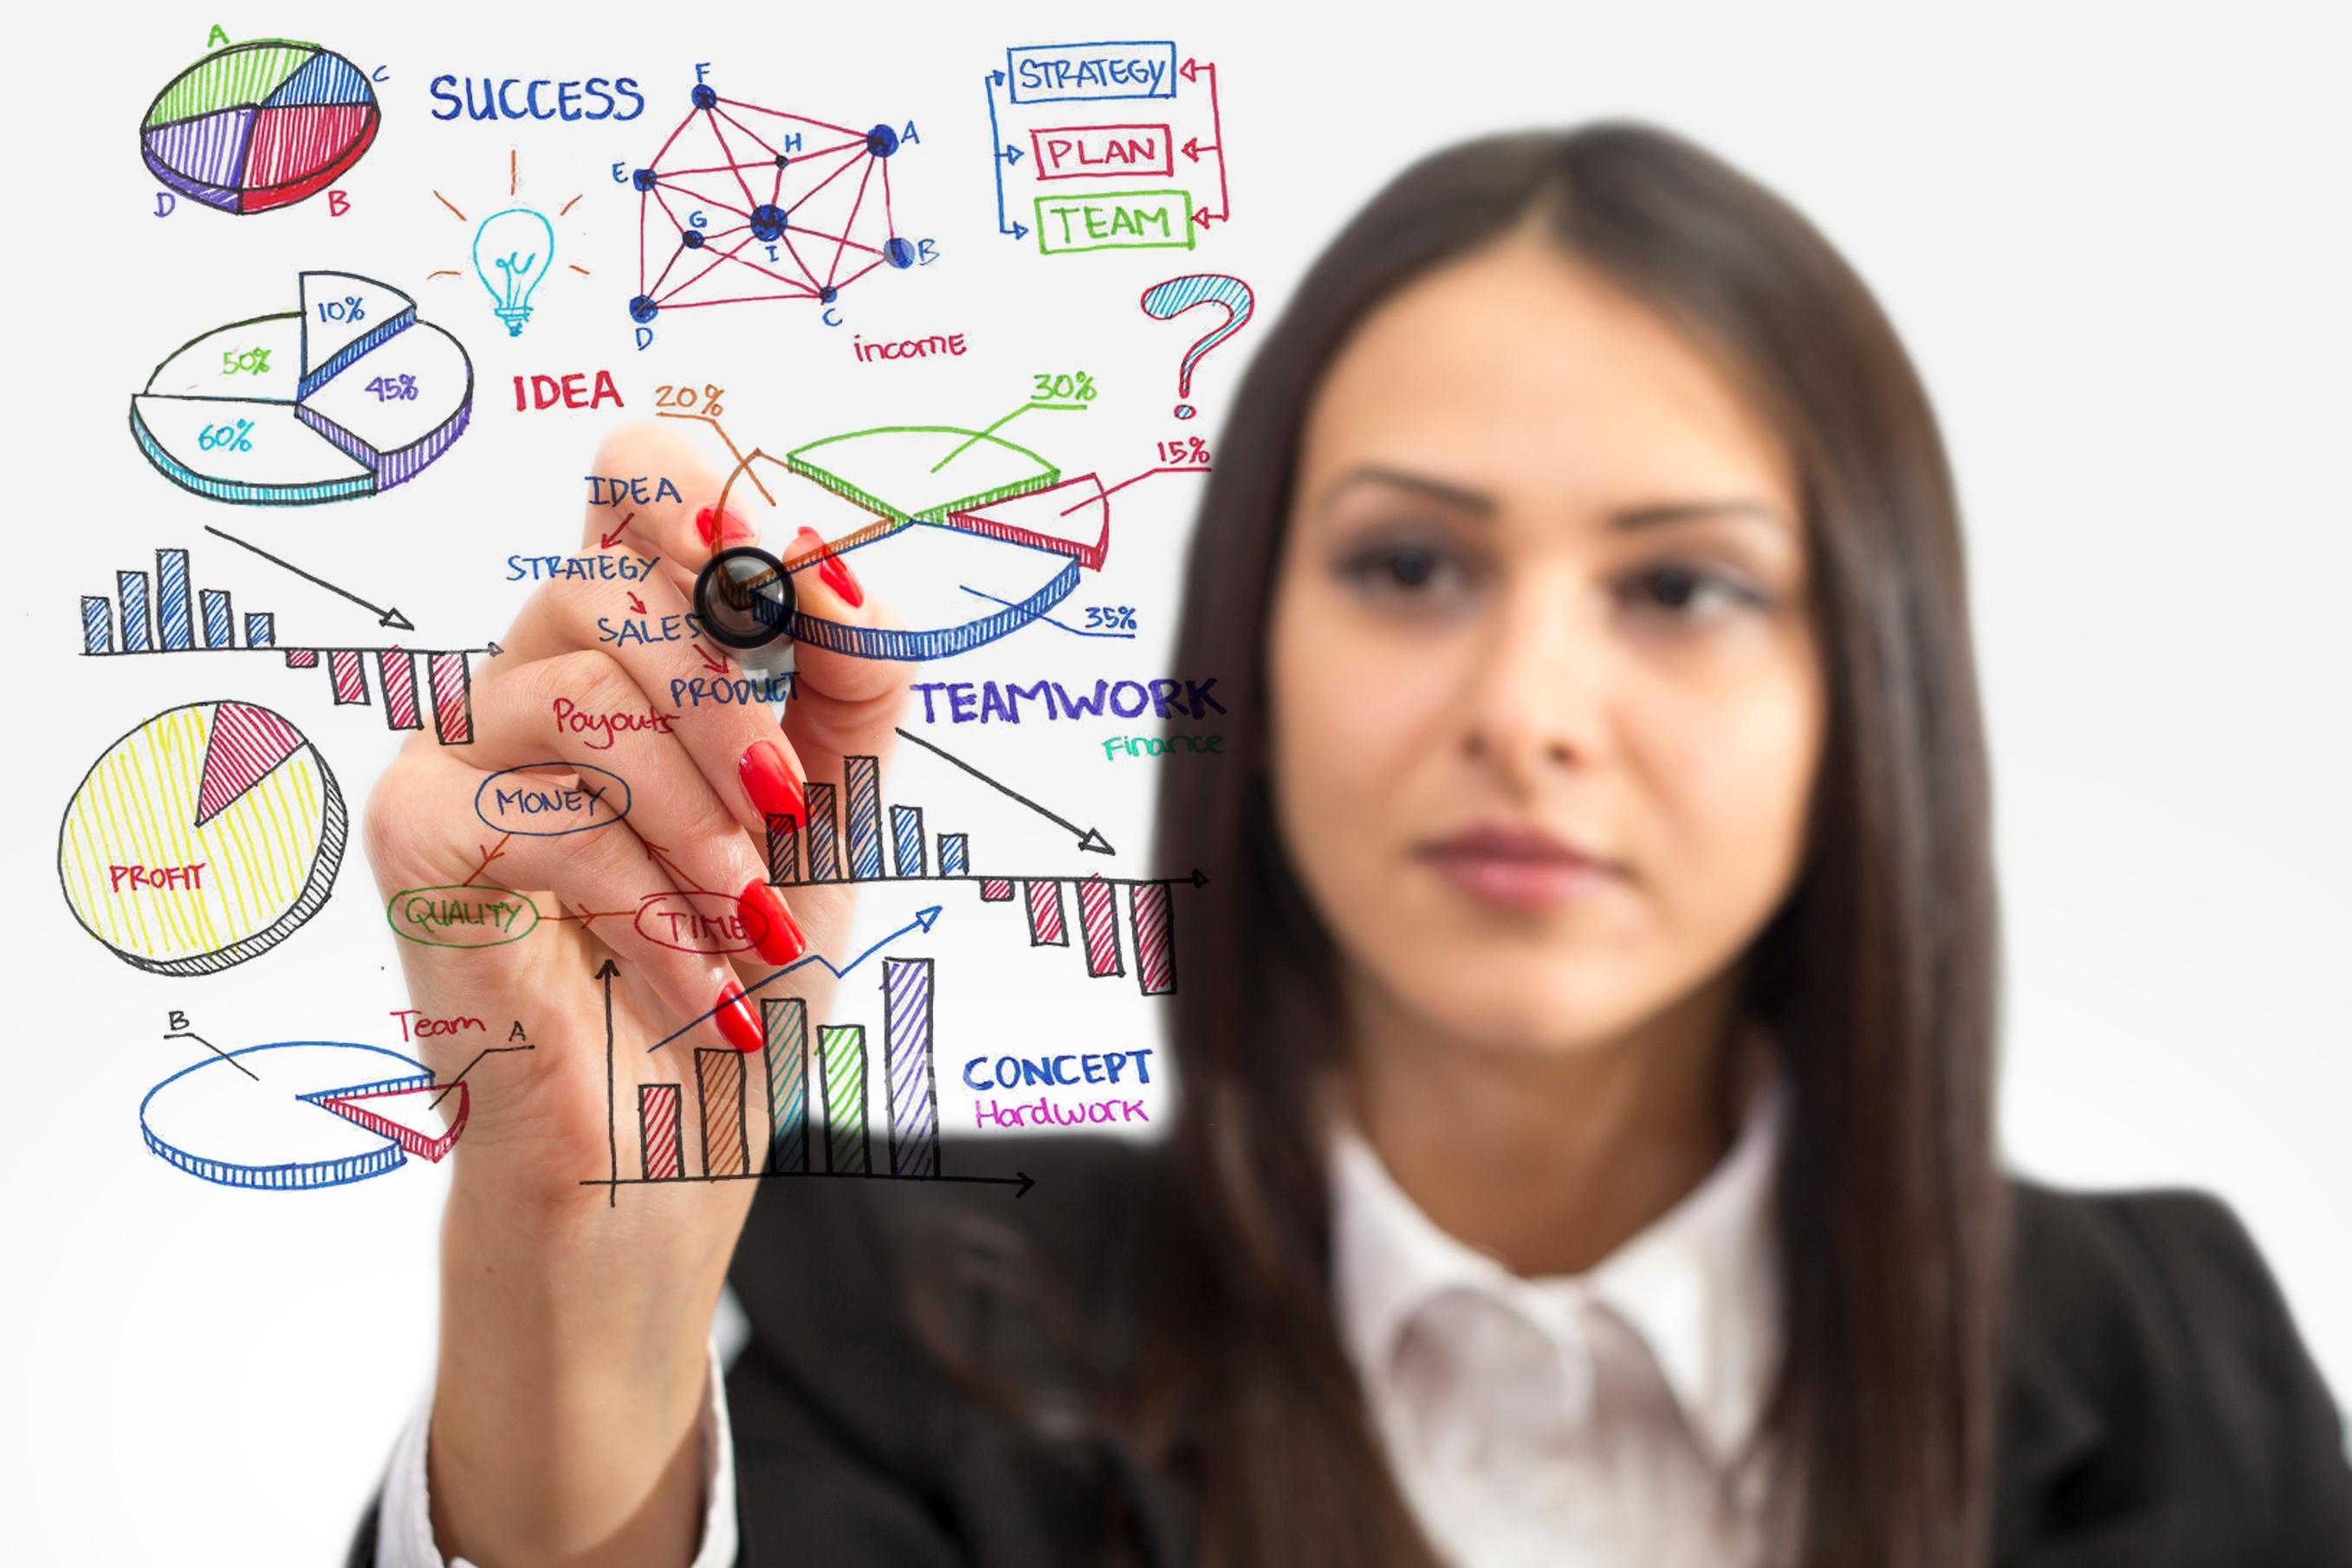 Harness creativity through focus